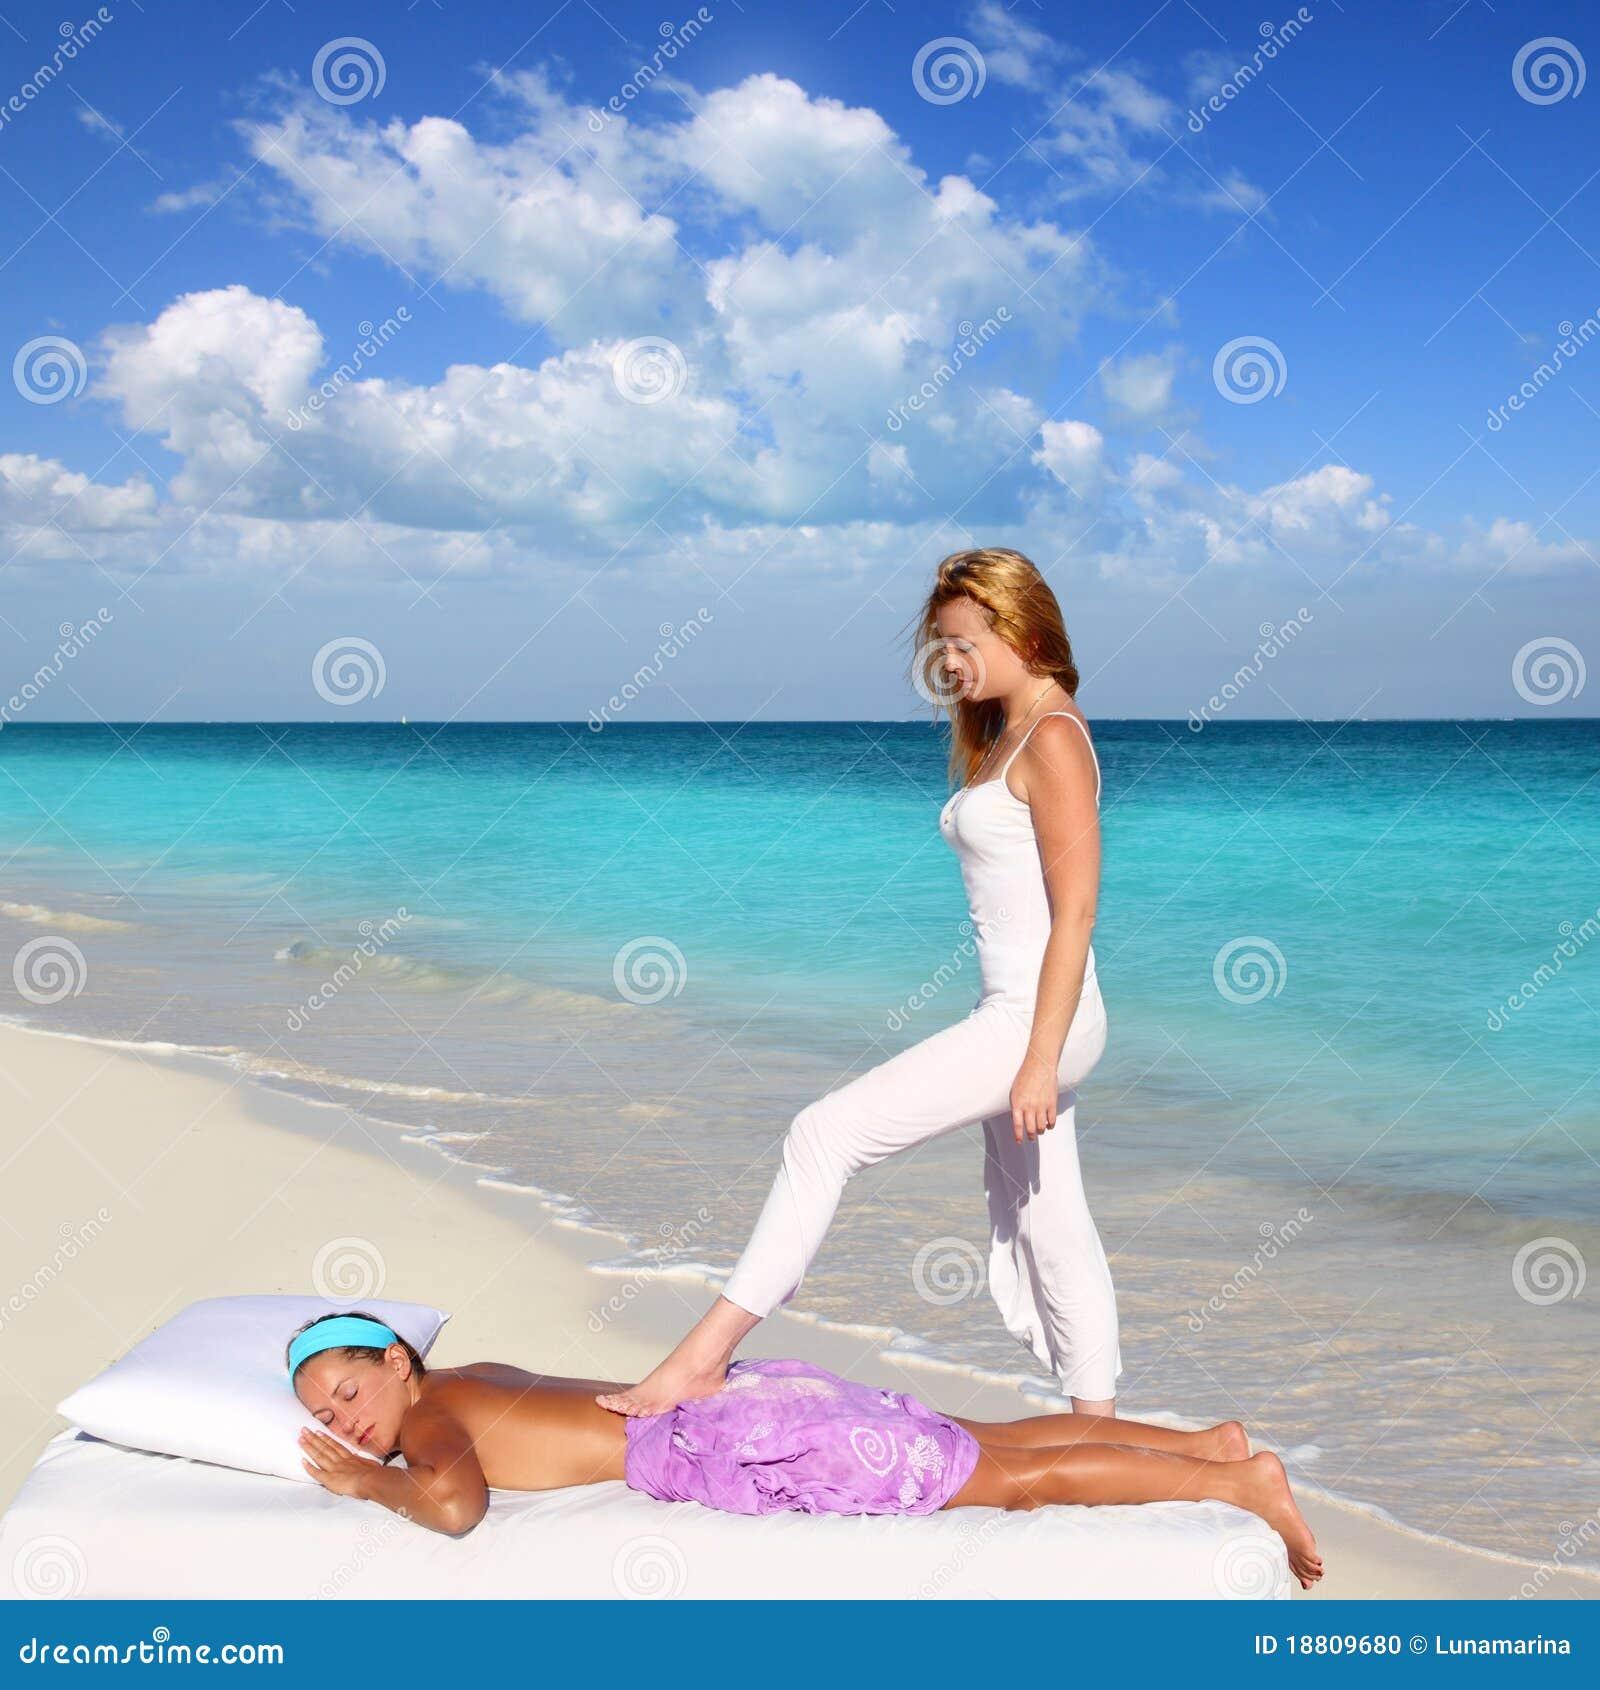 Thai Virgin Massage Islands